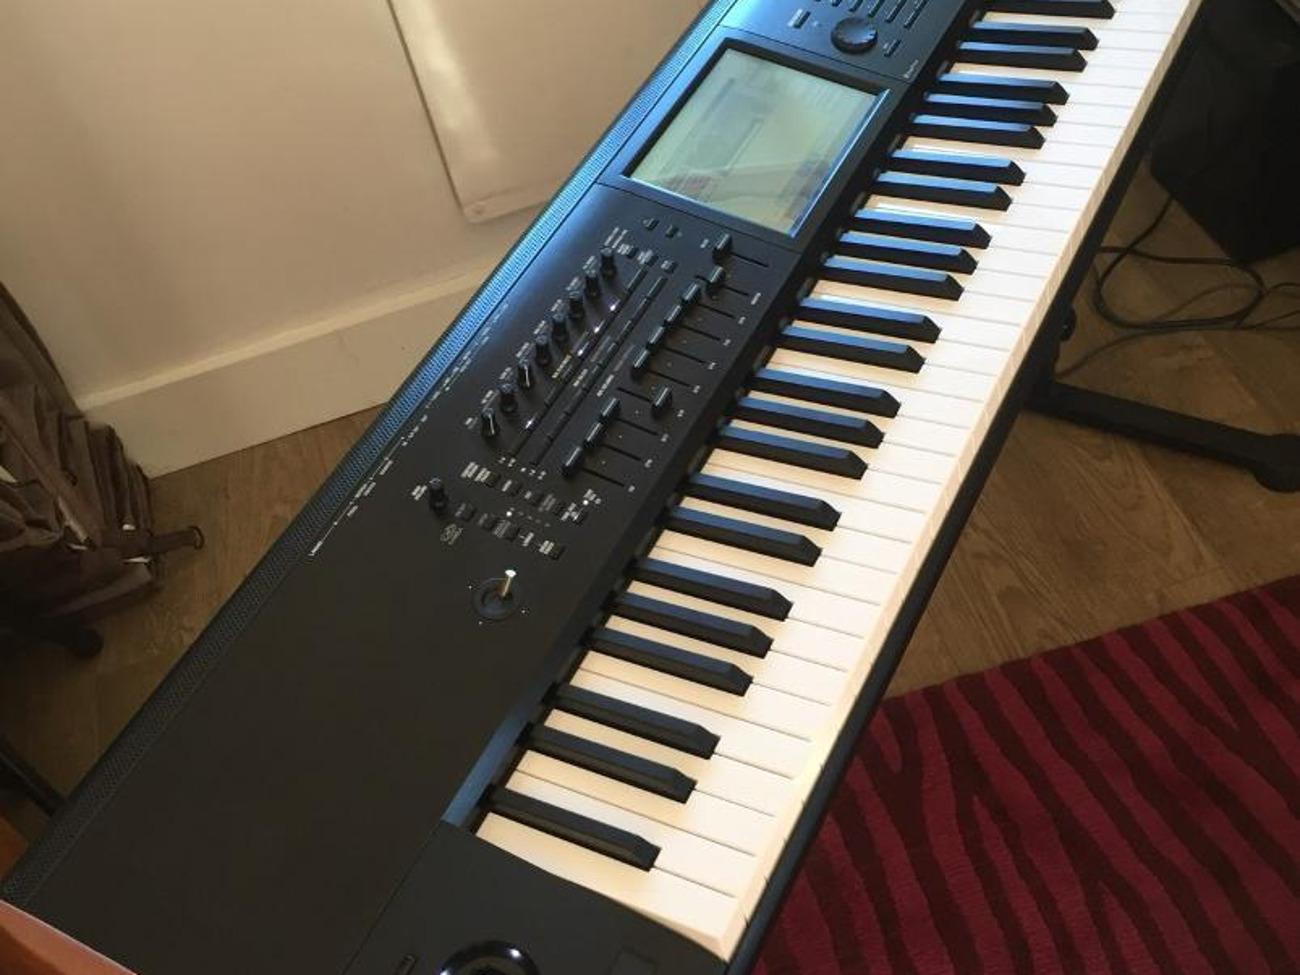 Korg Kronos 2 88 keys